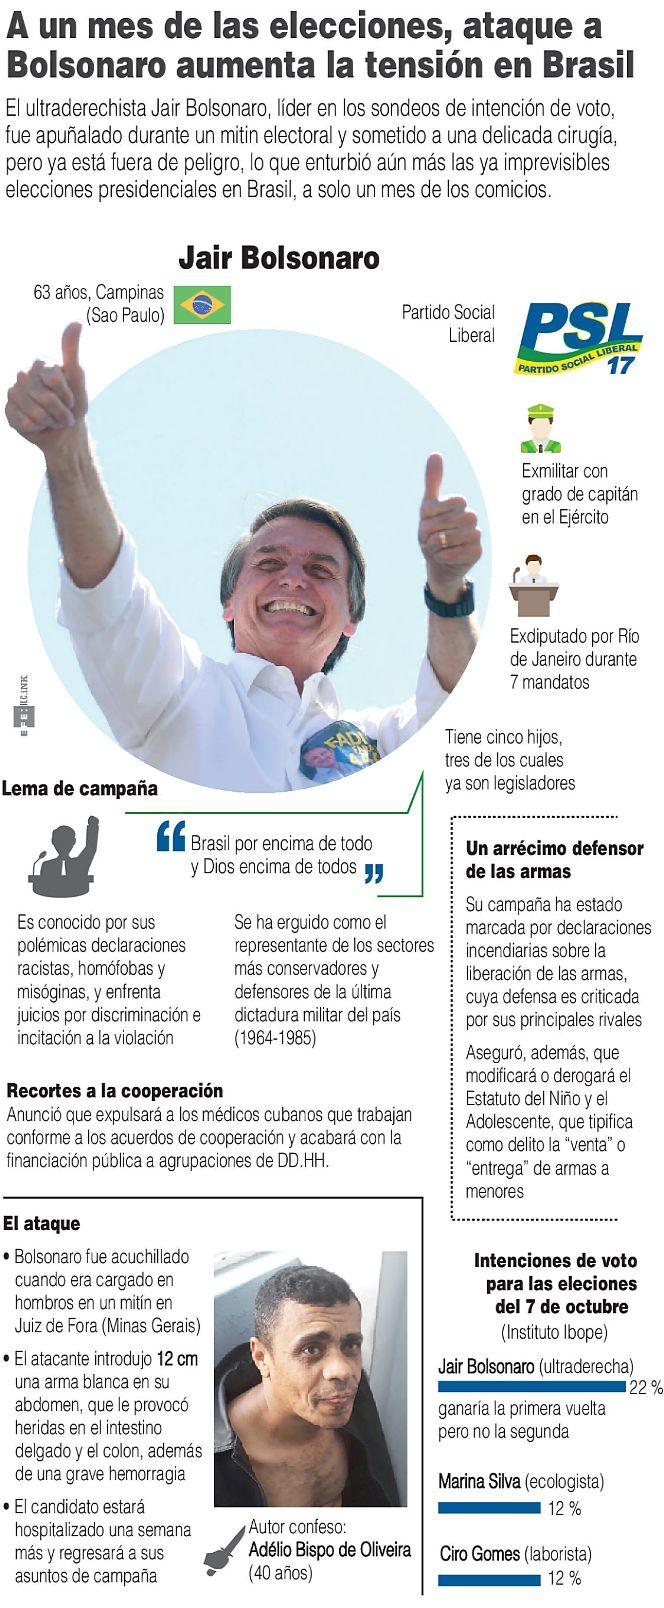 Jair-Bolsonaro-un-atentado-impulsa-al-candidato